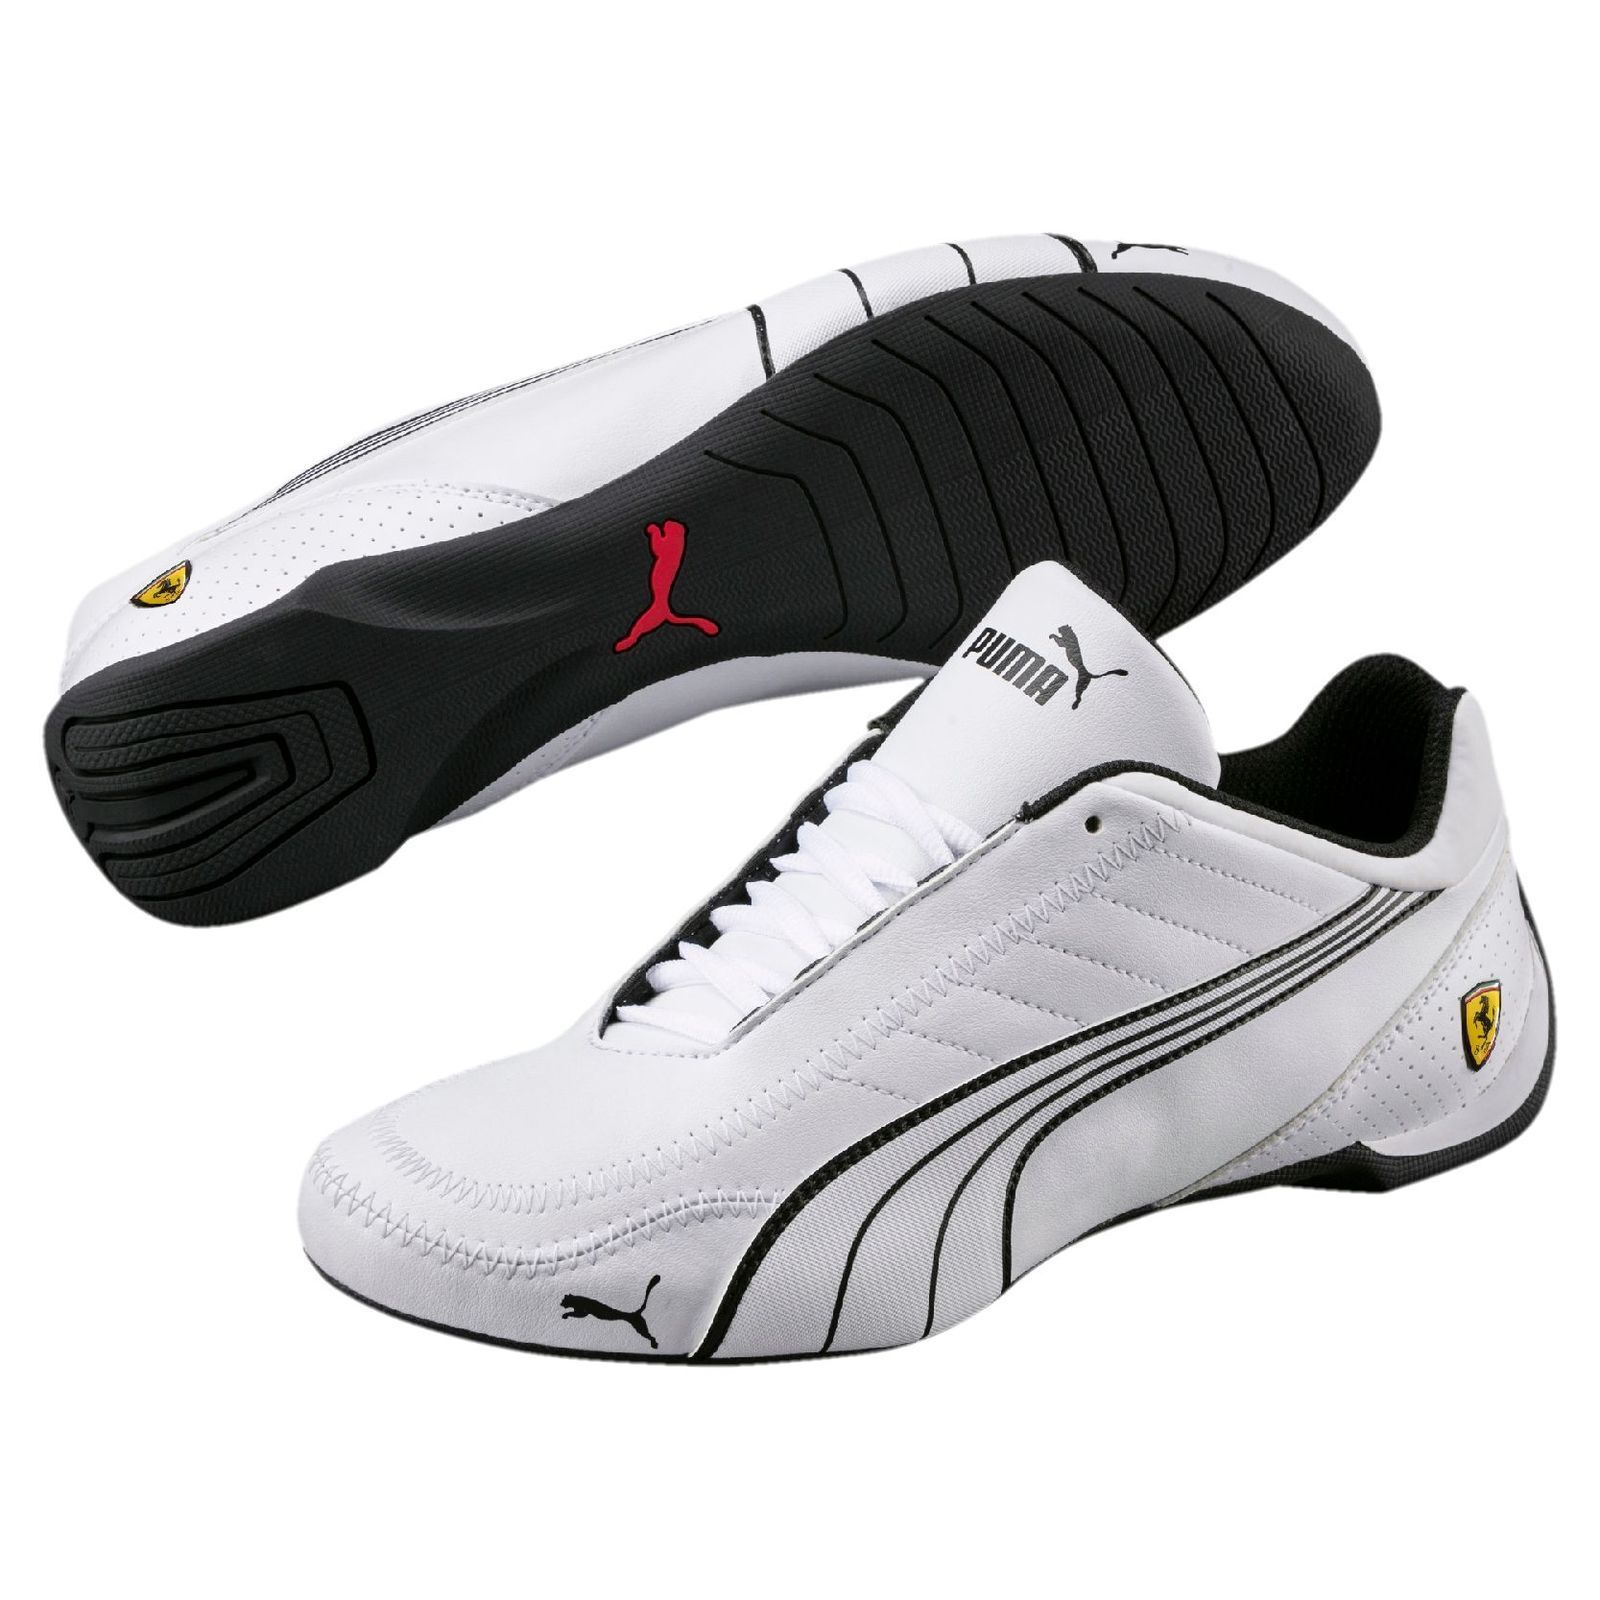 Nuevo Para Hombre Puma Ferrari Future Kart Motorsport Zapatos blancoo Negro 306170 Car 03